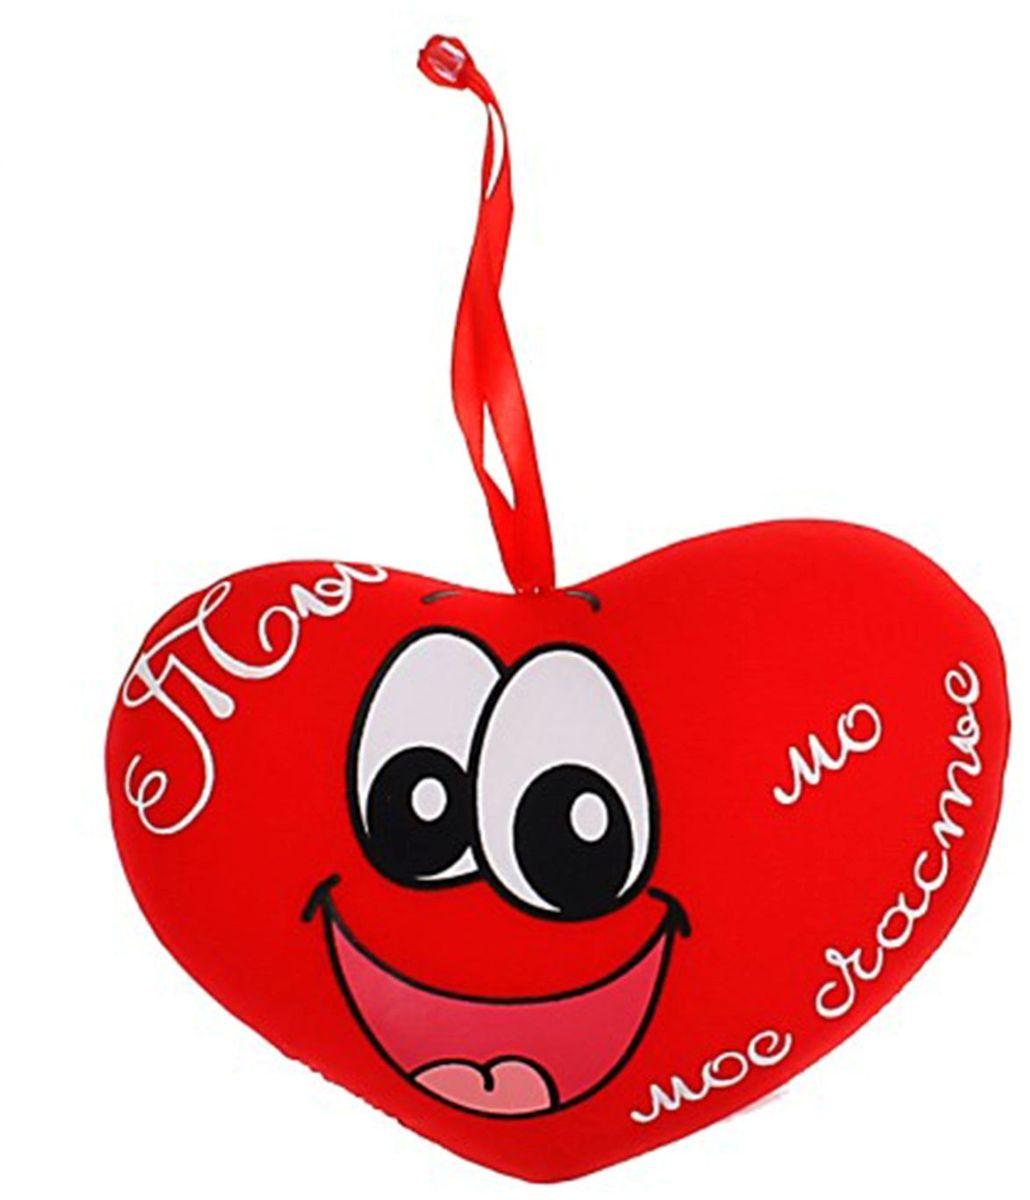 Sima-land Мягкая игрушка-антистресс Сердечко Ты мое счастье 319978 игрушка антистресс сима ленд сердечко 330476